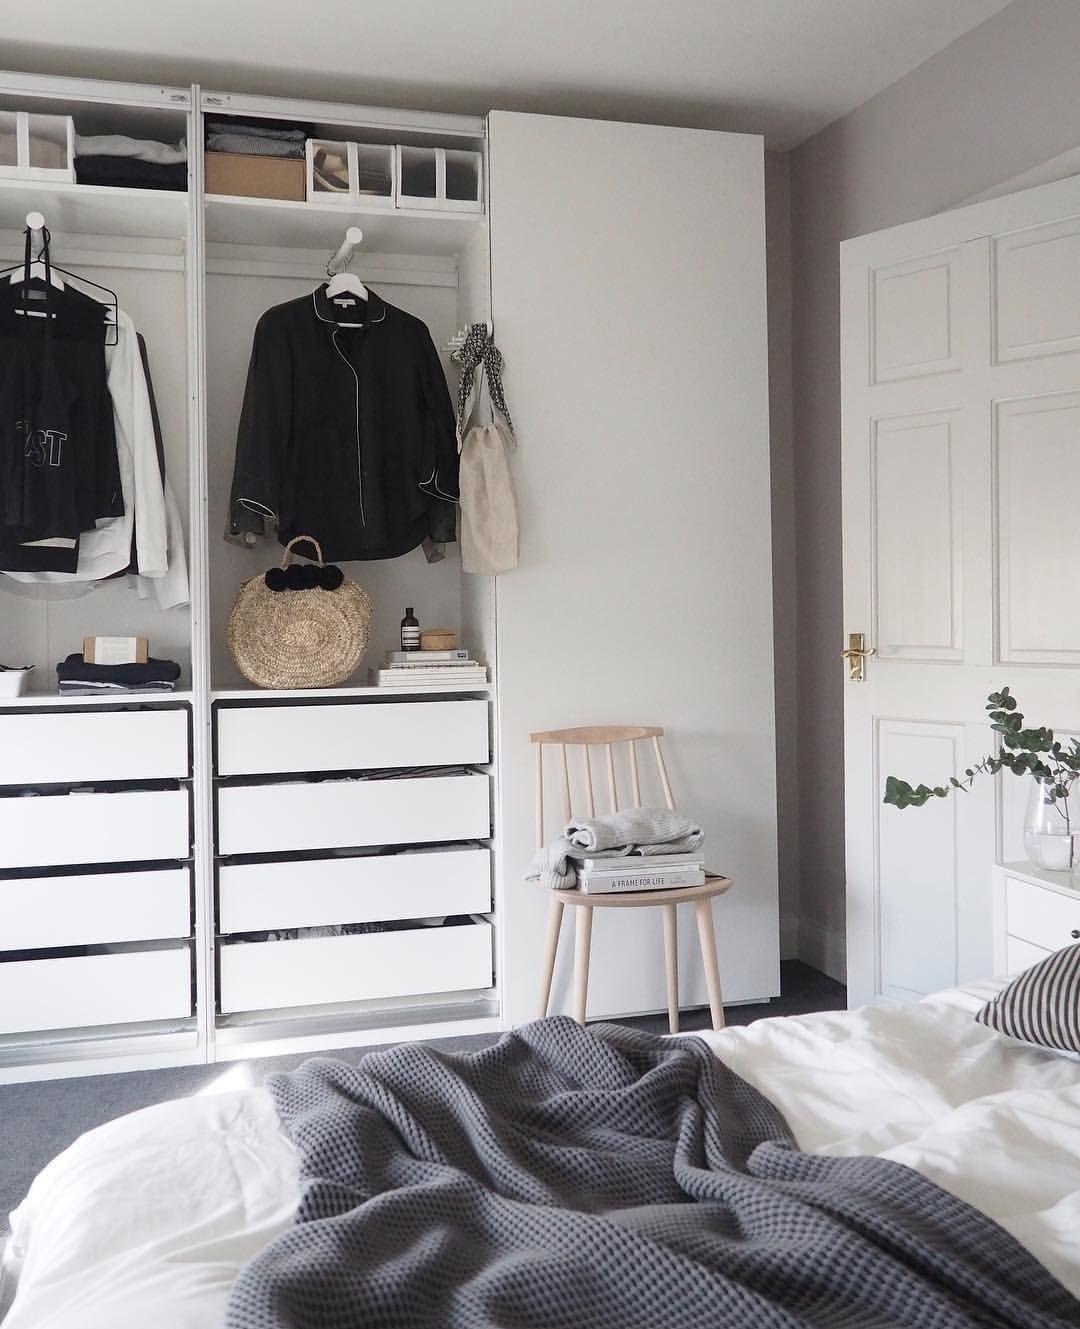 Calm Quiet Bedroom With Farrow Ball Peignoir Ideas For A